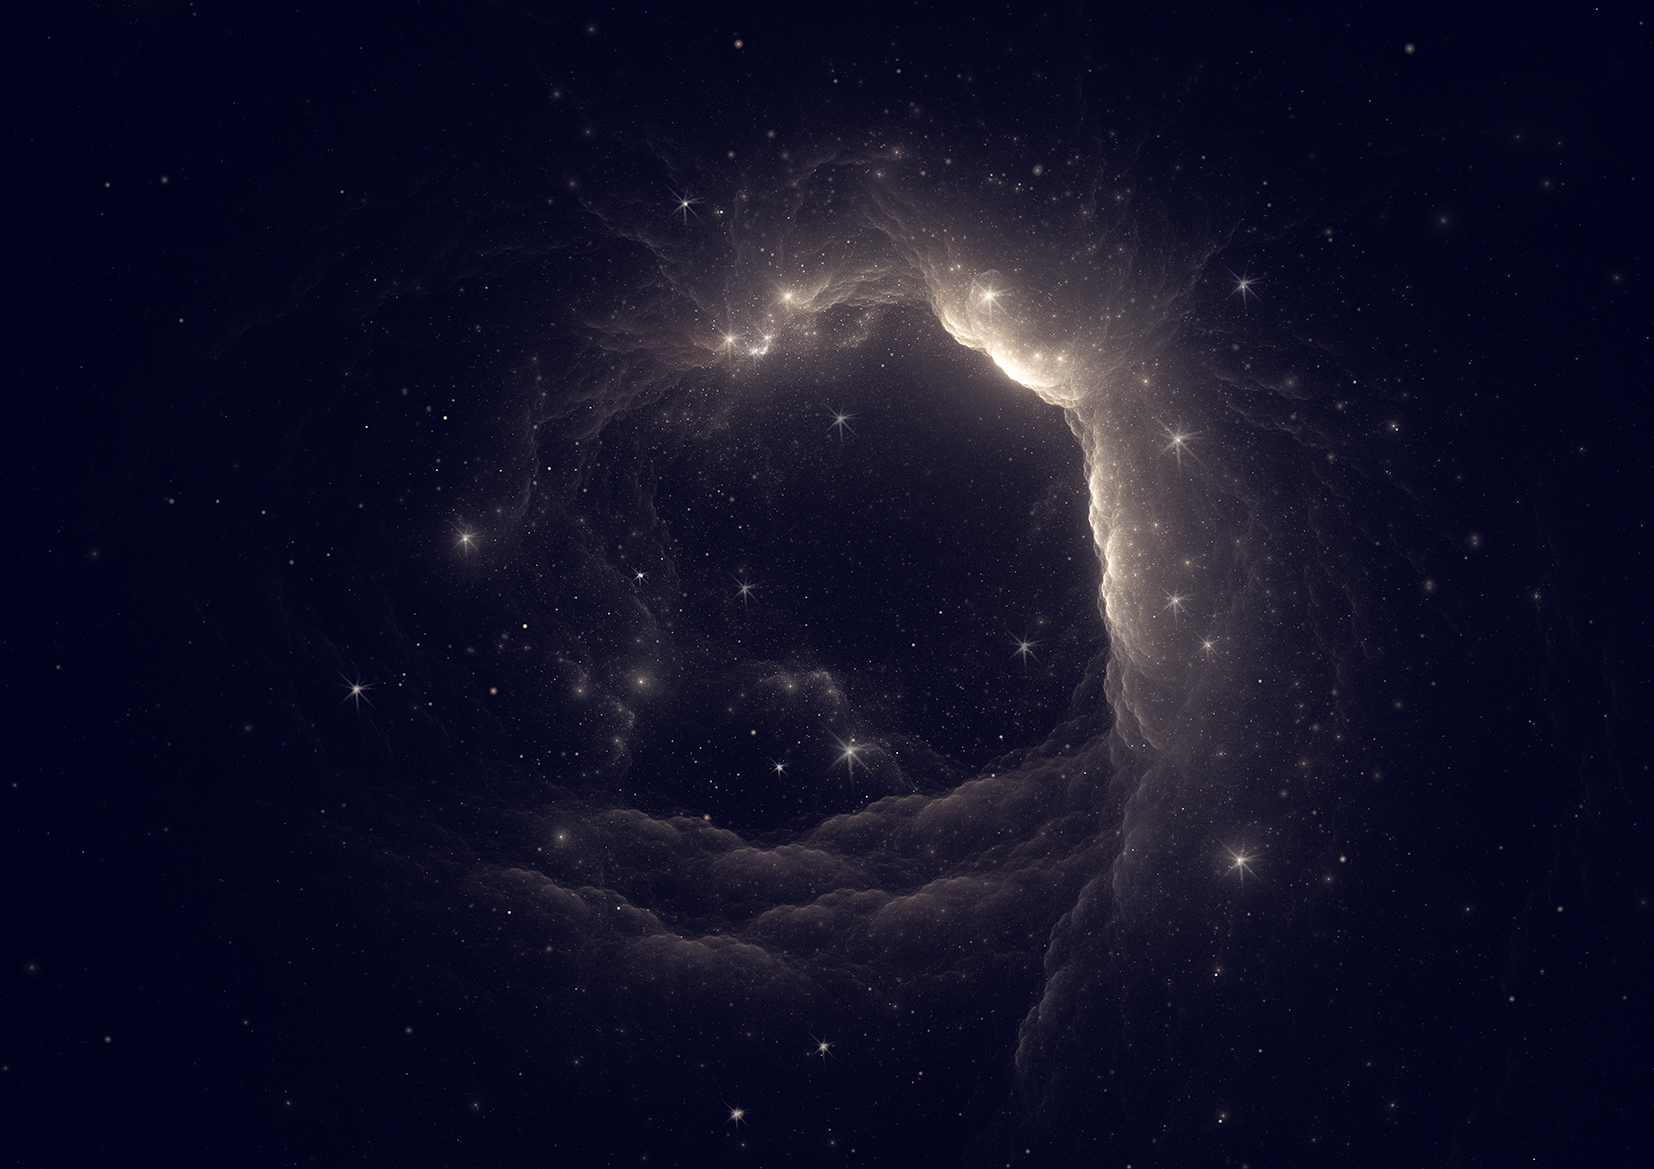 19 black hole.jpg